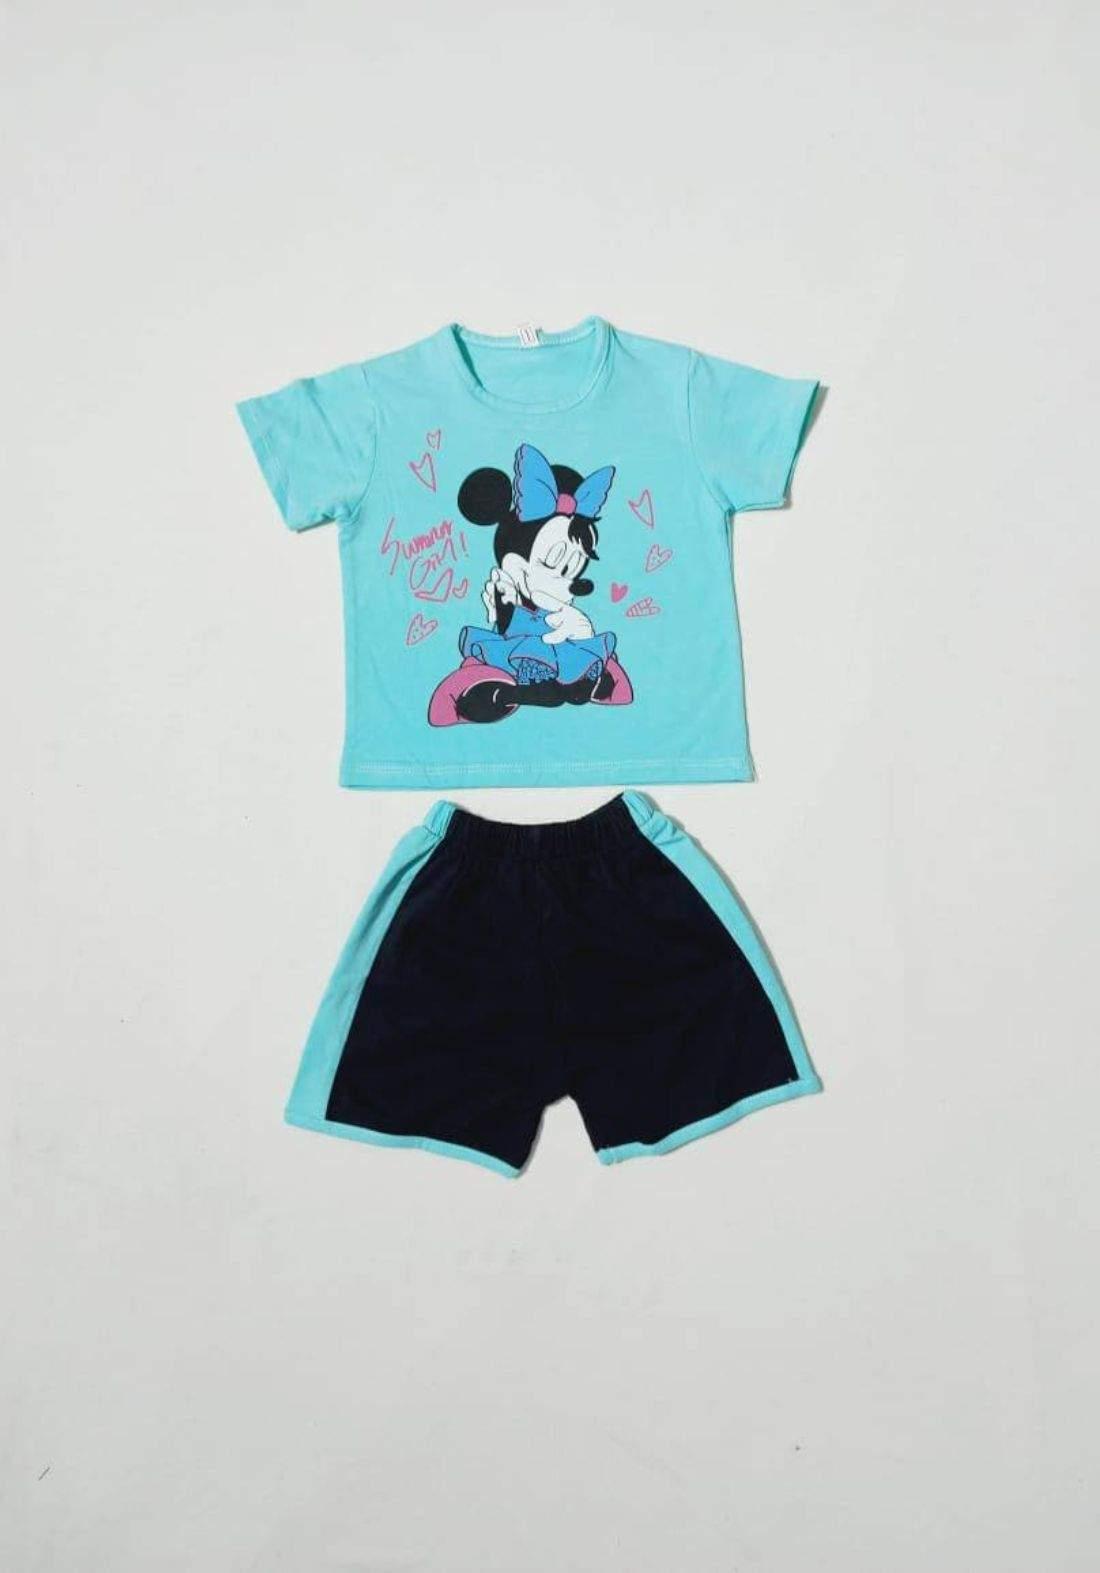 tracksuit for girls blue  (t-shirt+short) ( تراكسوت بناتي  تركوازي  (شورت و تيشيرت